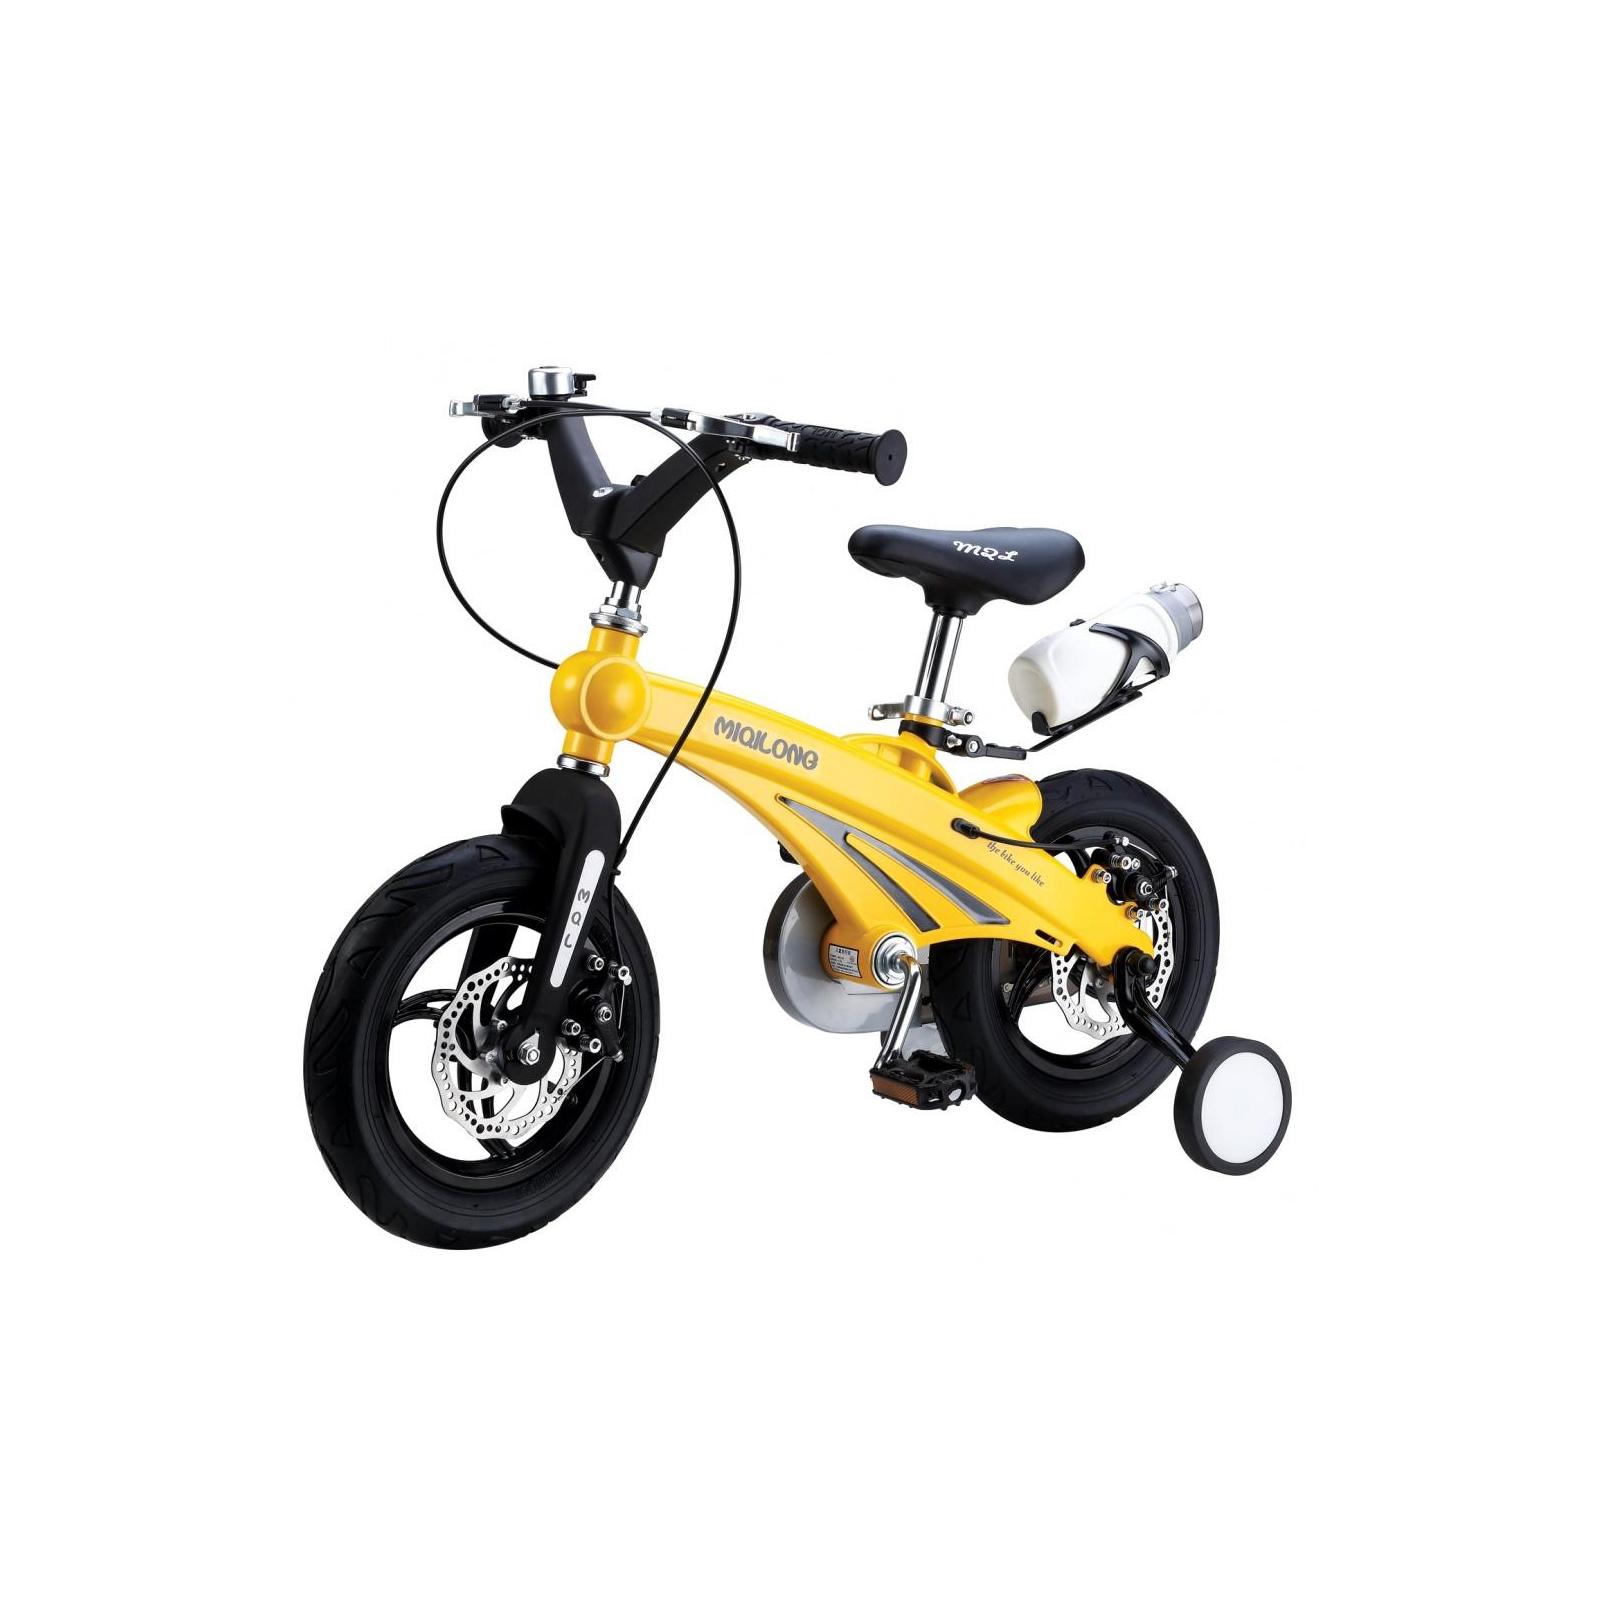 Детский велосипед Miqilong GN Желтый 12` (MQL-GN12-Yellow)